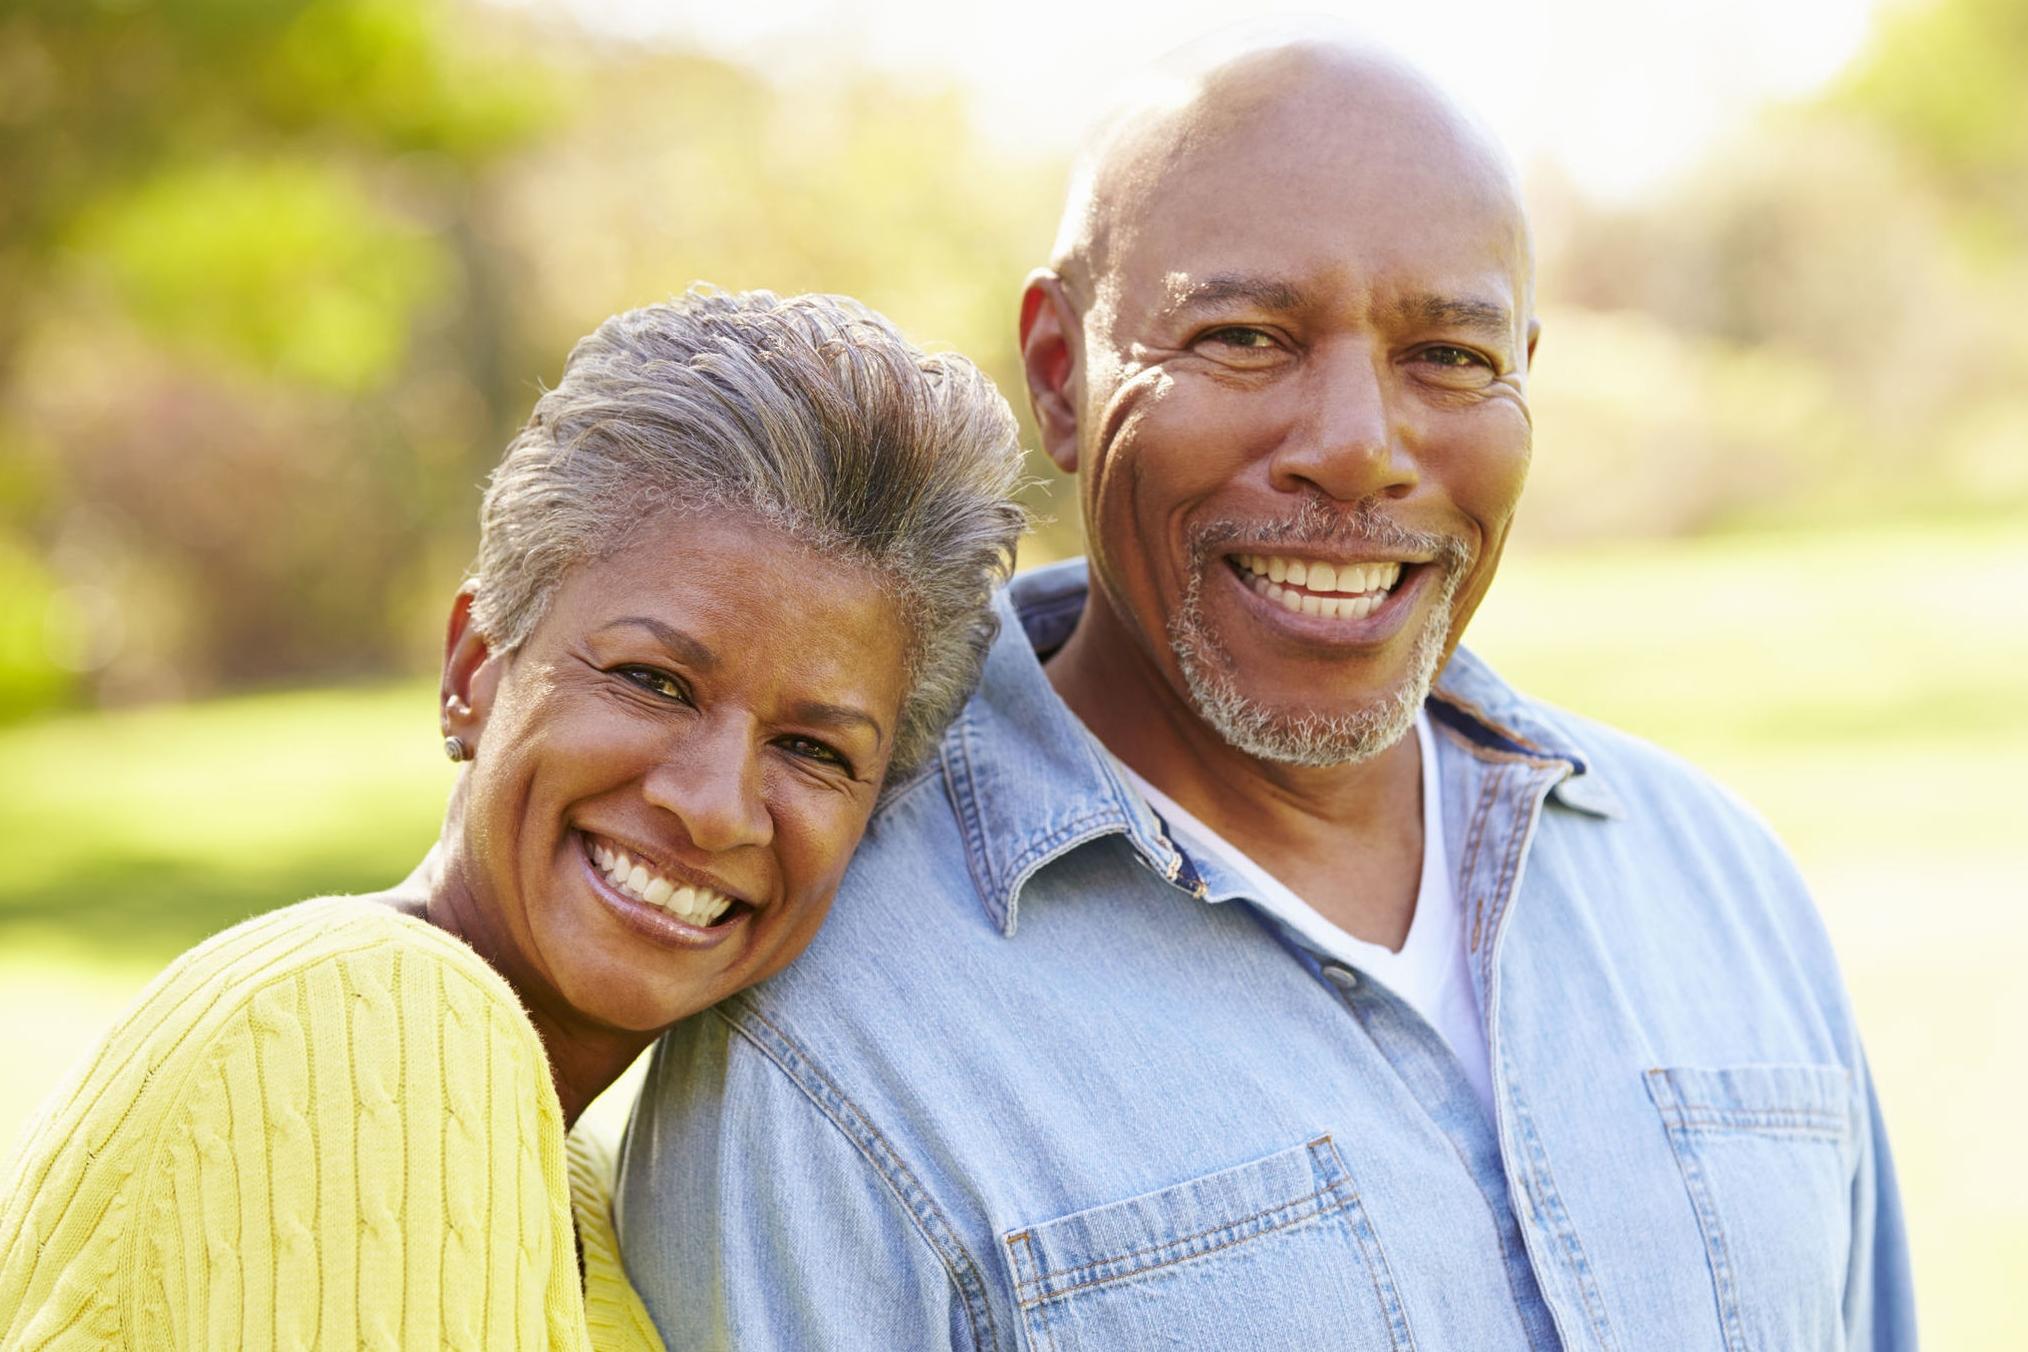 Dr. Koczarski can help you stay on track for optimal dental health.